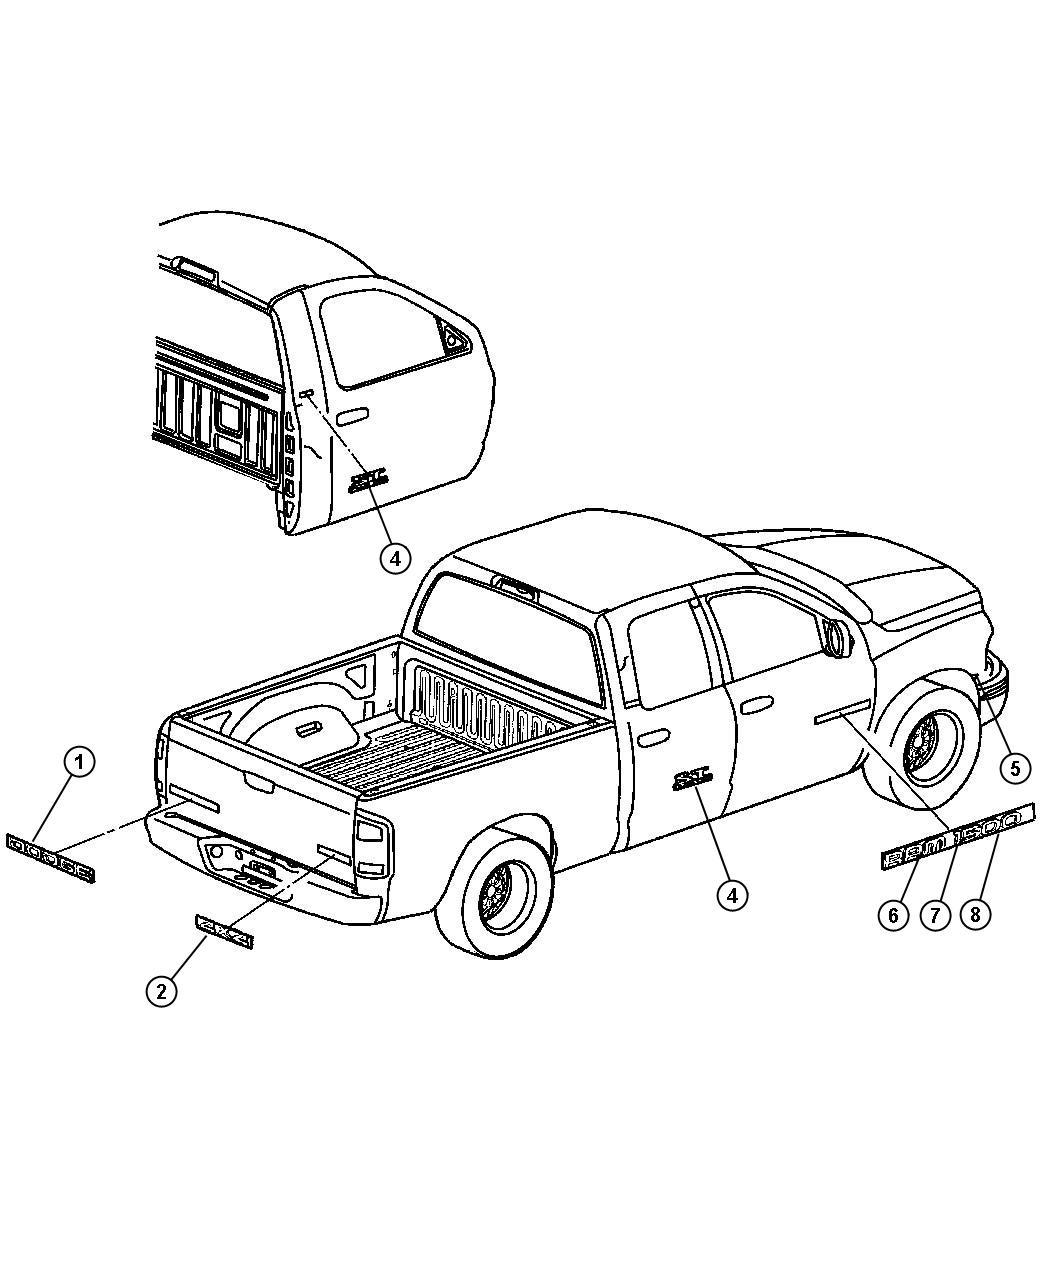 Diagram Wiring Diagram For Dodge Ram Hemi Full